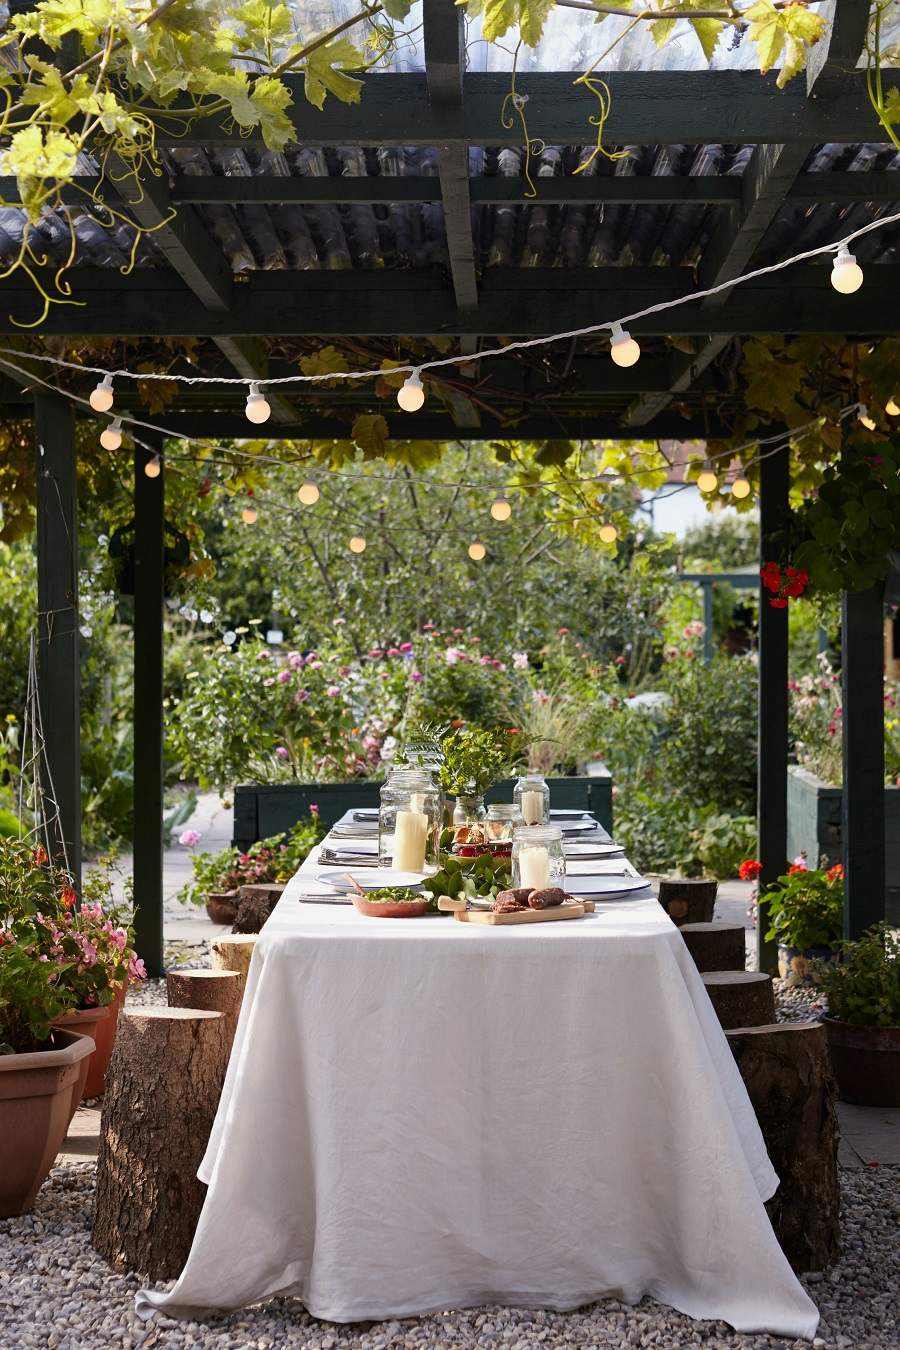 A Garden Room for All Seasons